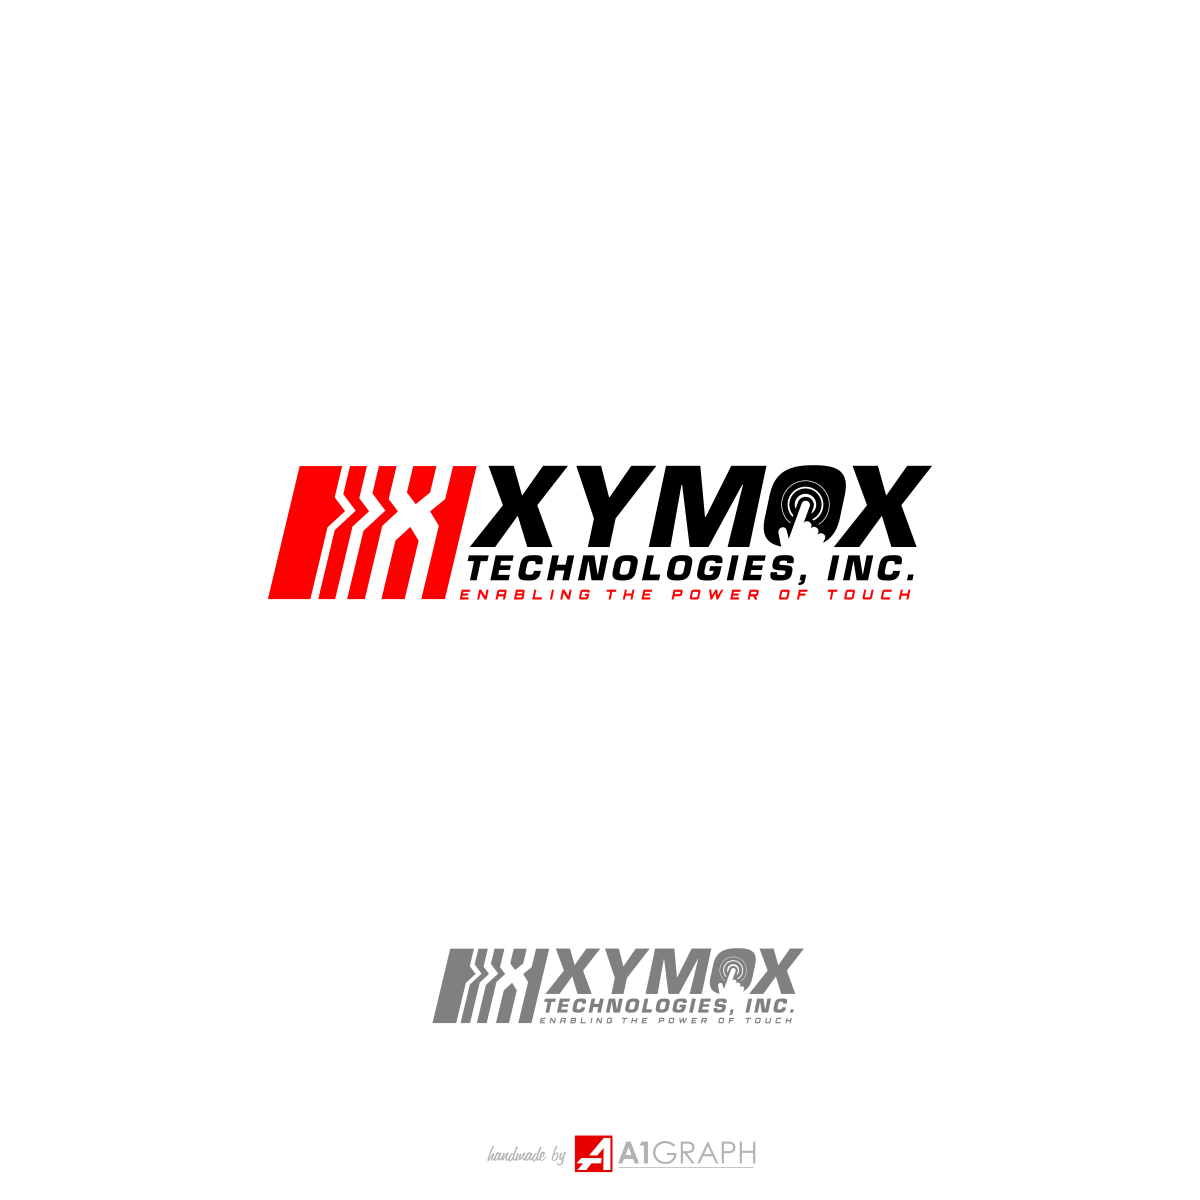 Xymox needs new slogan incorporated into logo